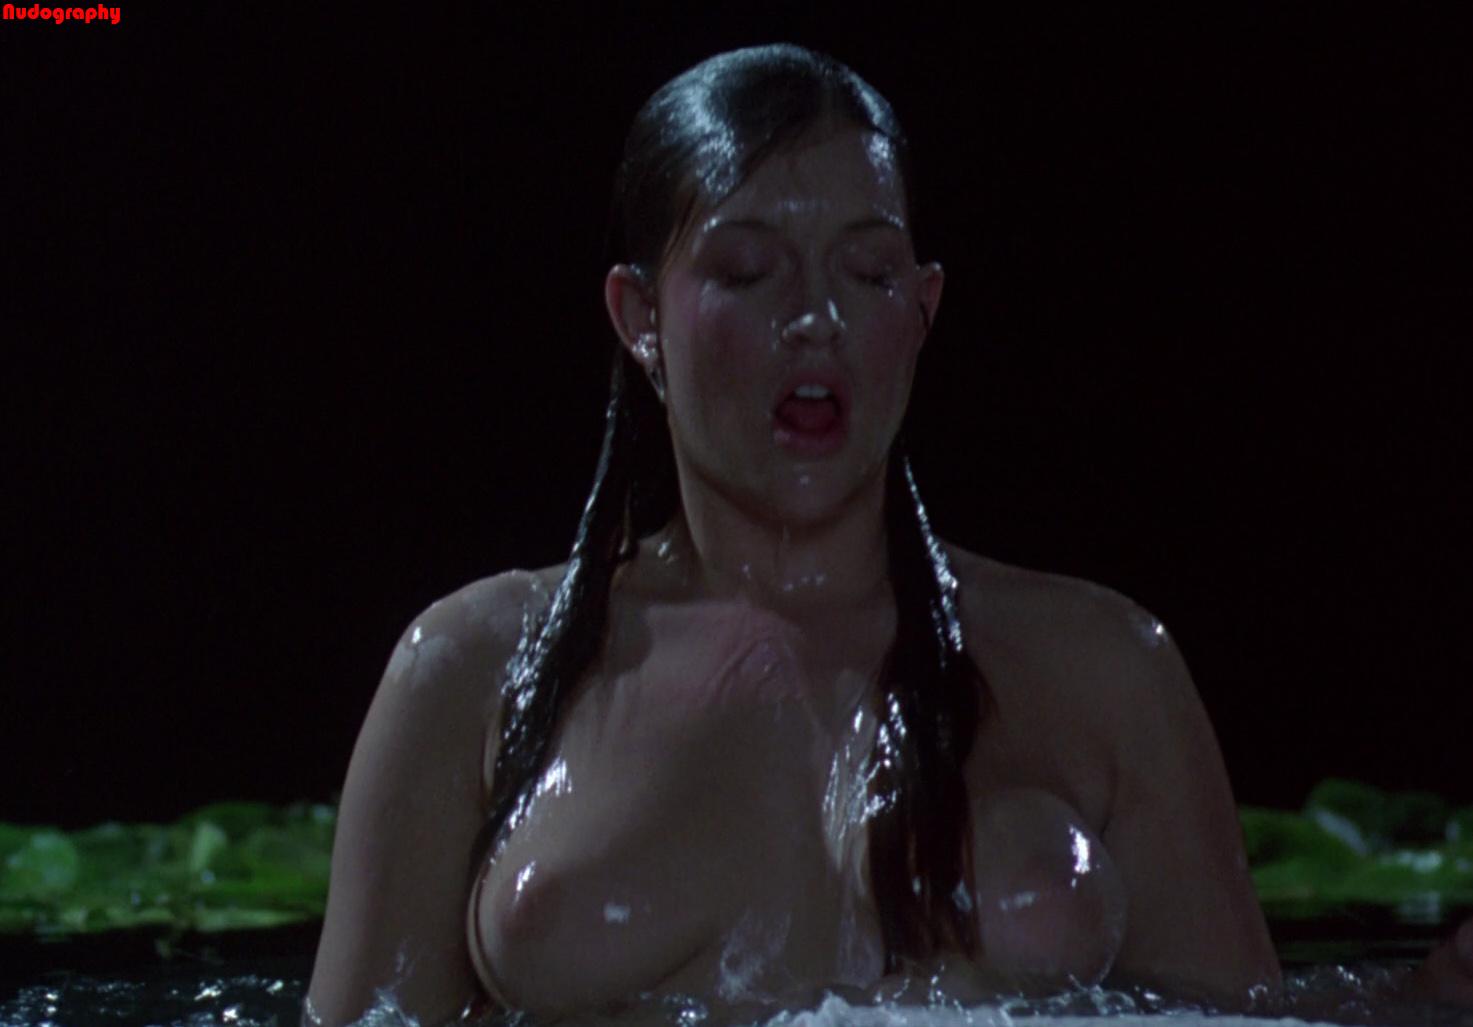 jennifer reyna fake nude images